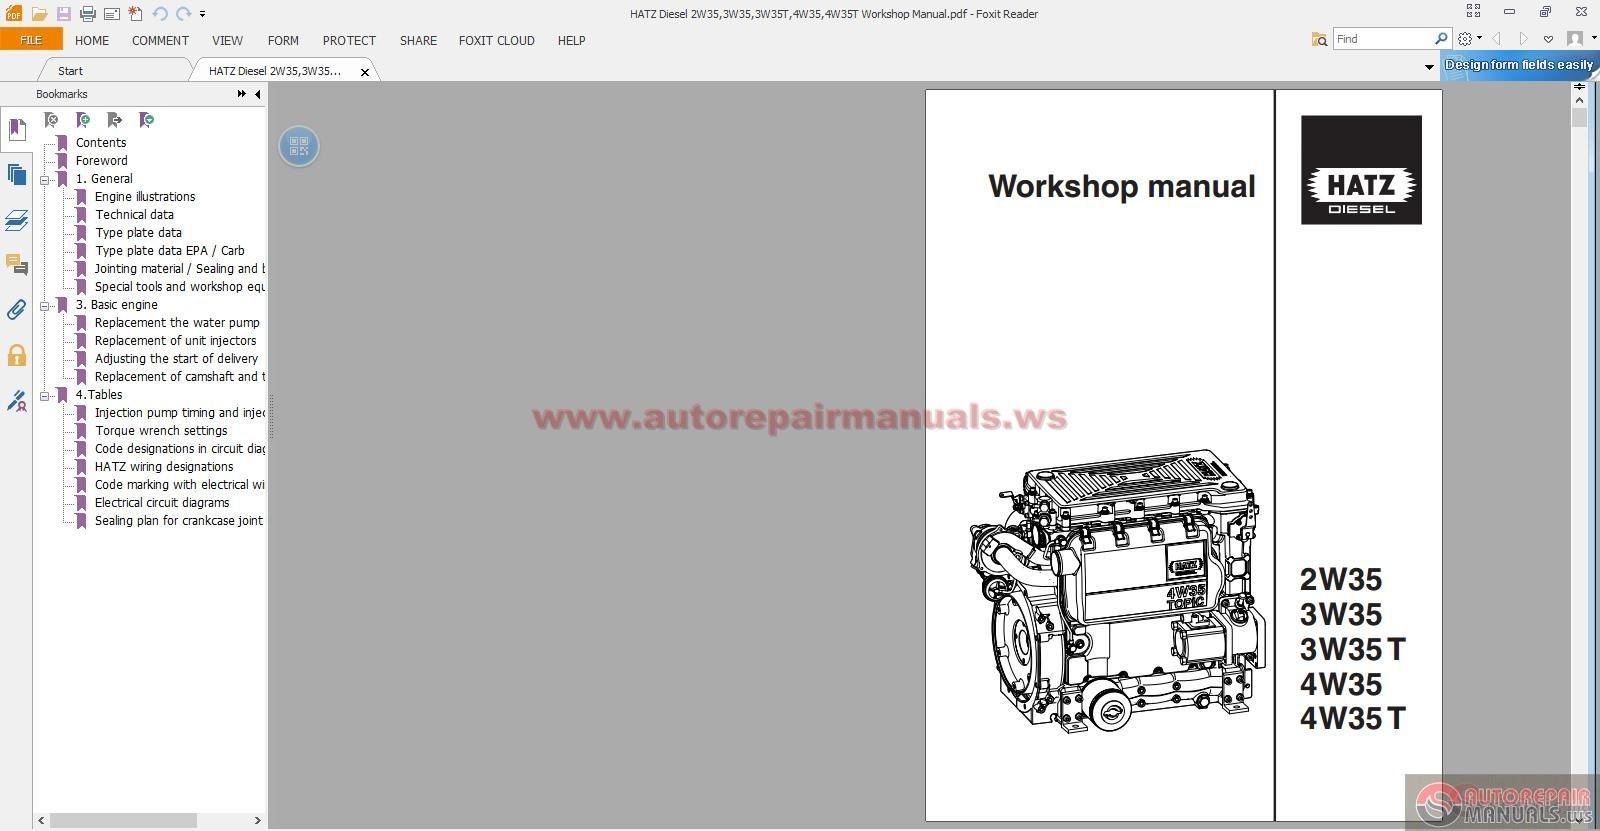 View and Download Hatz 2-4L30 workshop manual online. Hatz Diesel engine  Workshop manual. 2-4L30 Engine pdf manual download.